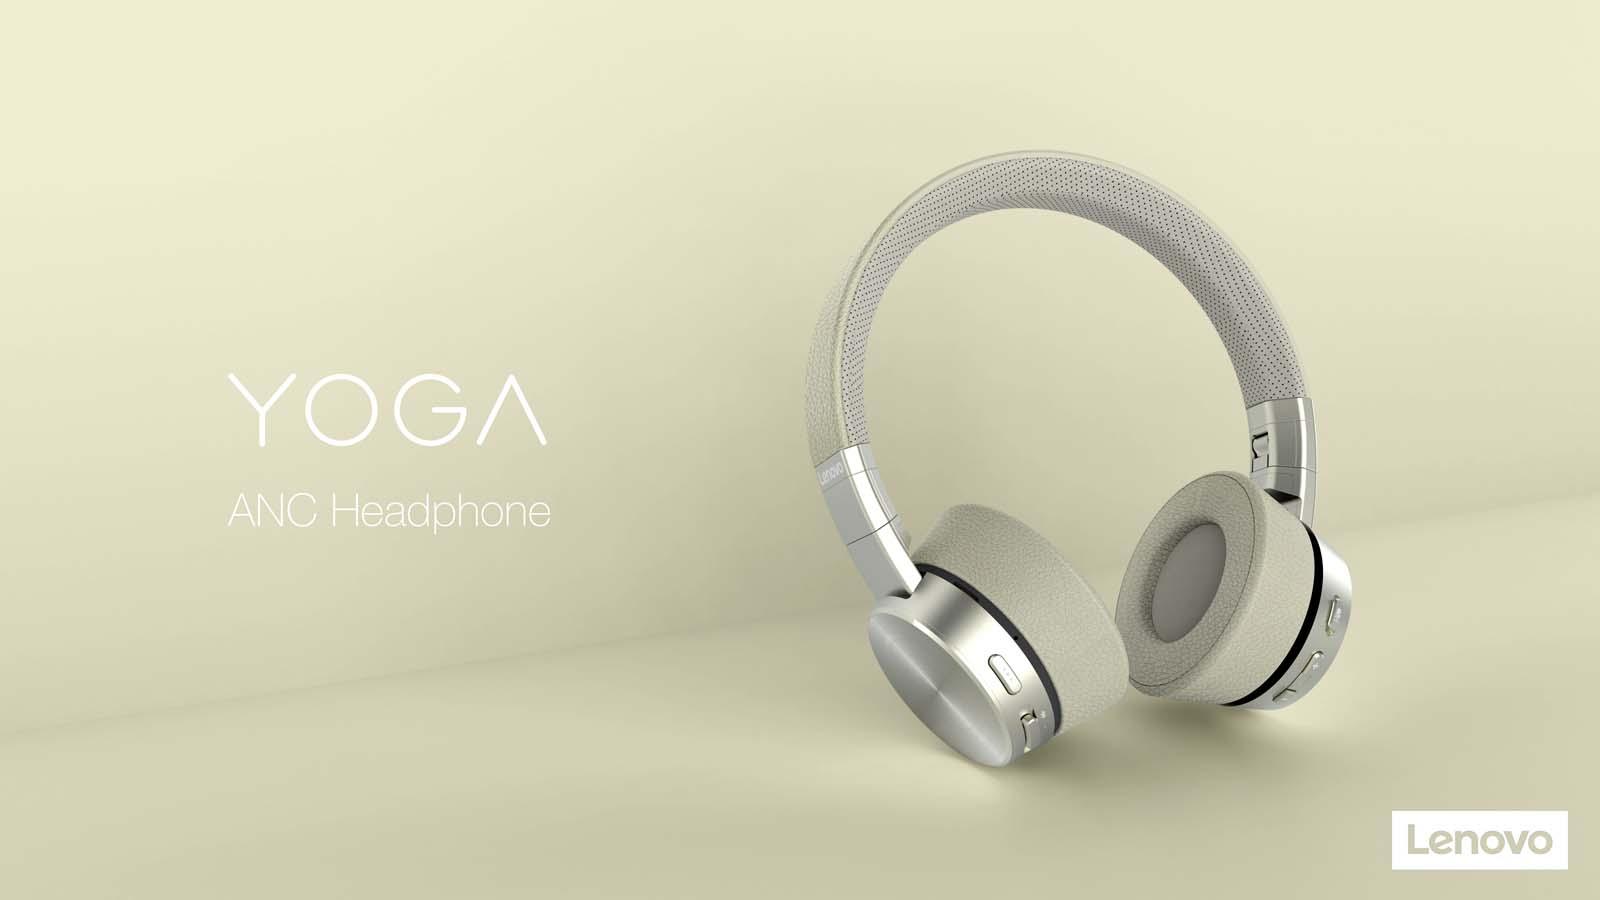 Lenovo Yoga ANC Headphones 1